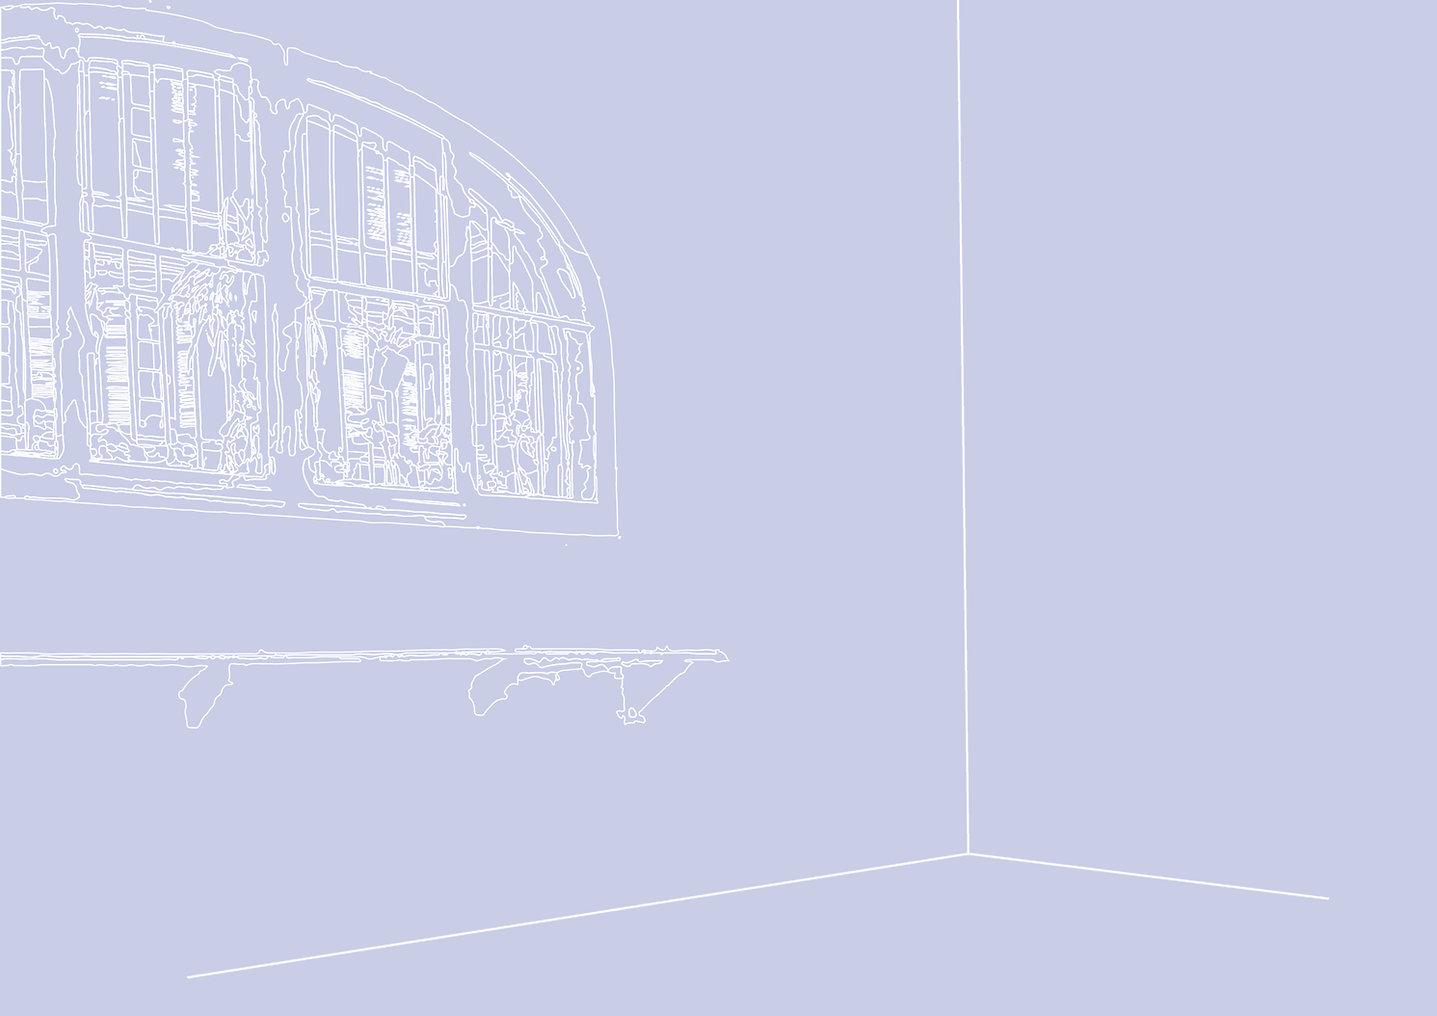 barre à terre(page).jpg